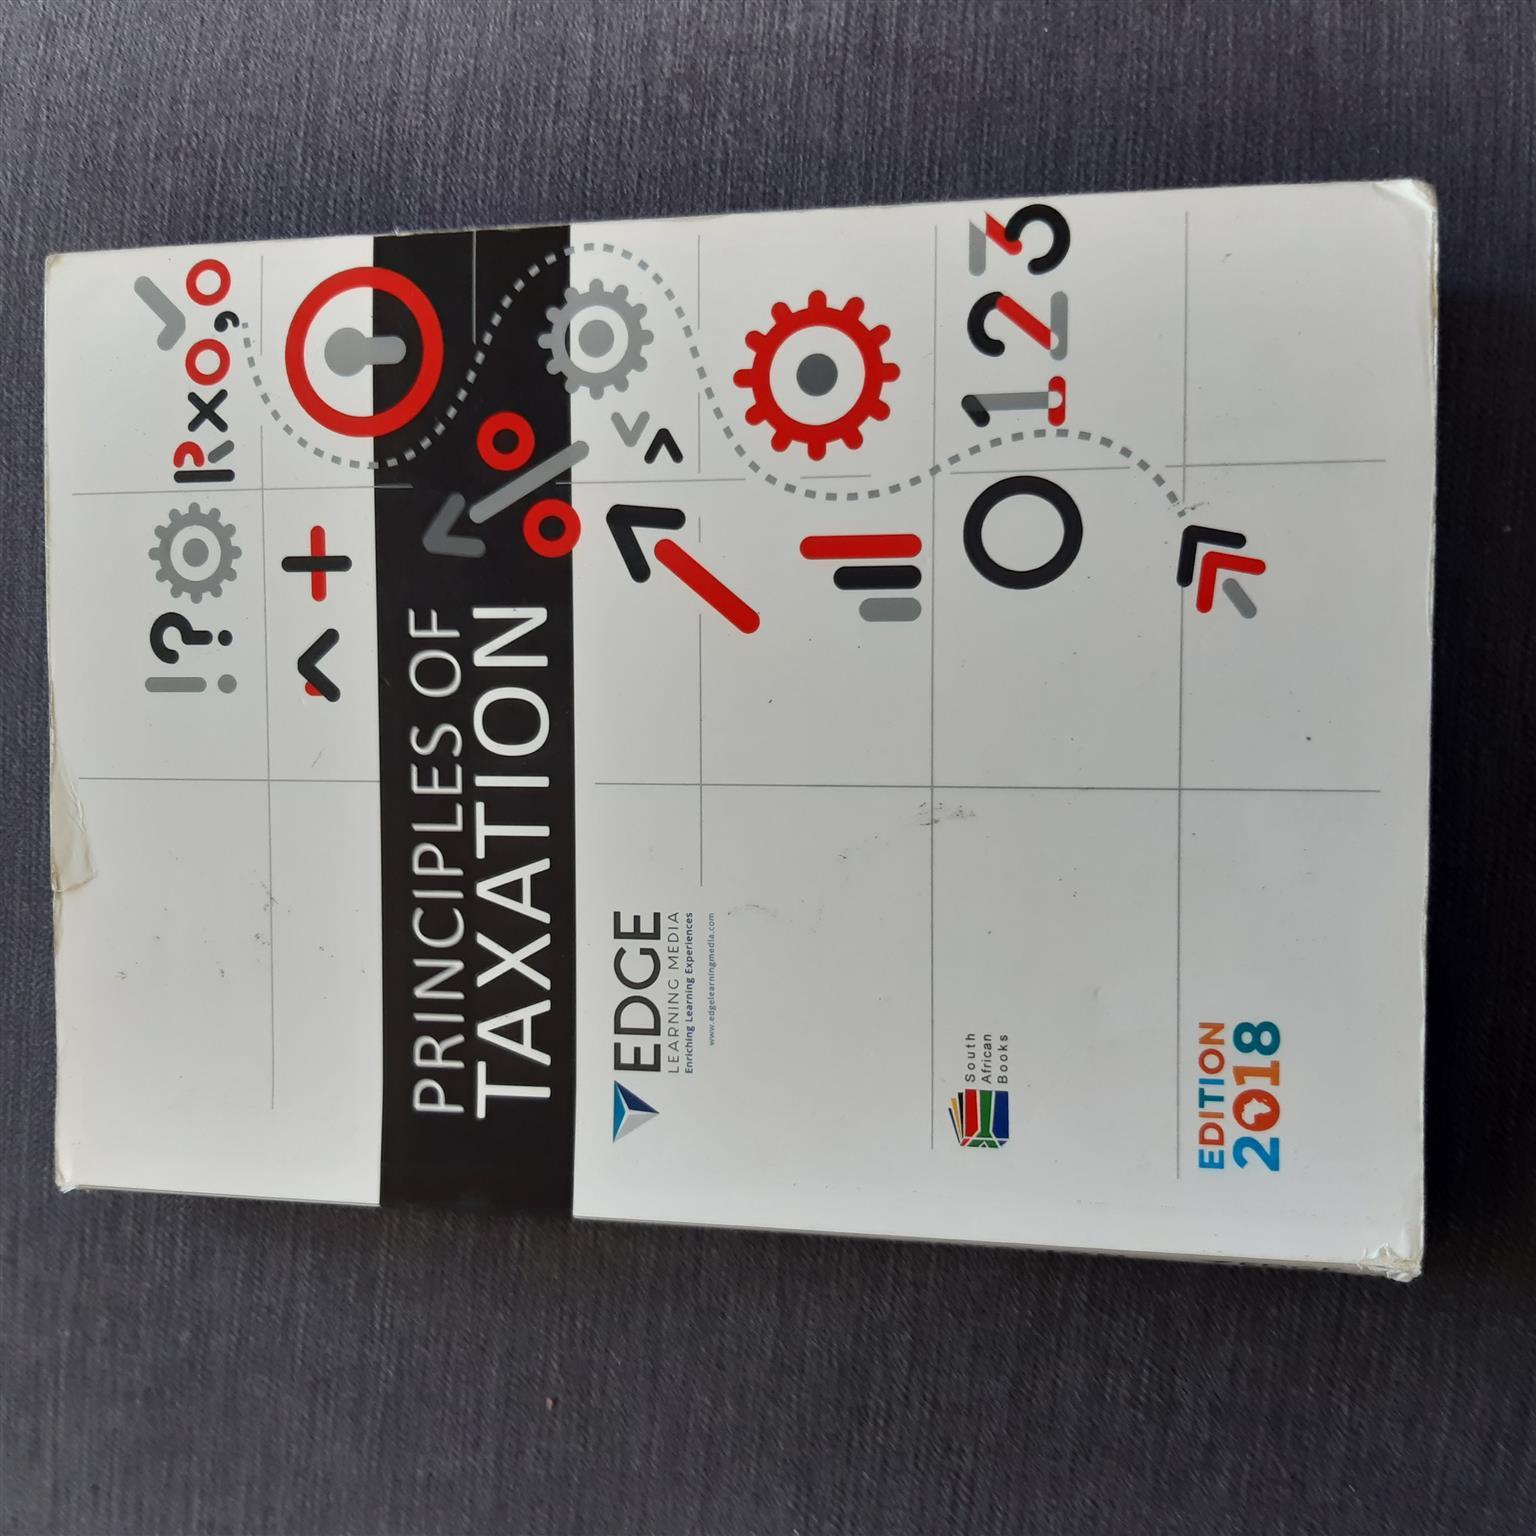 Academic BCOM GENERAL & BCOM LAW textbooks